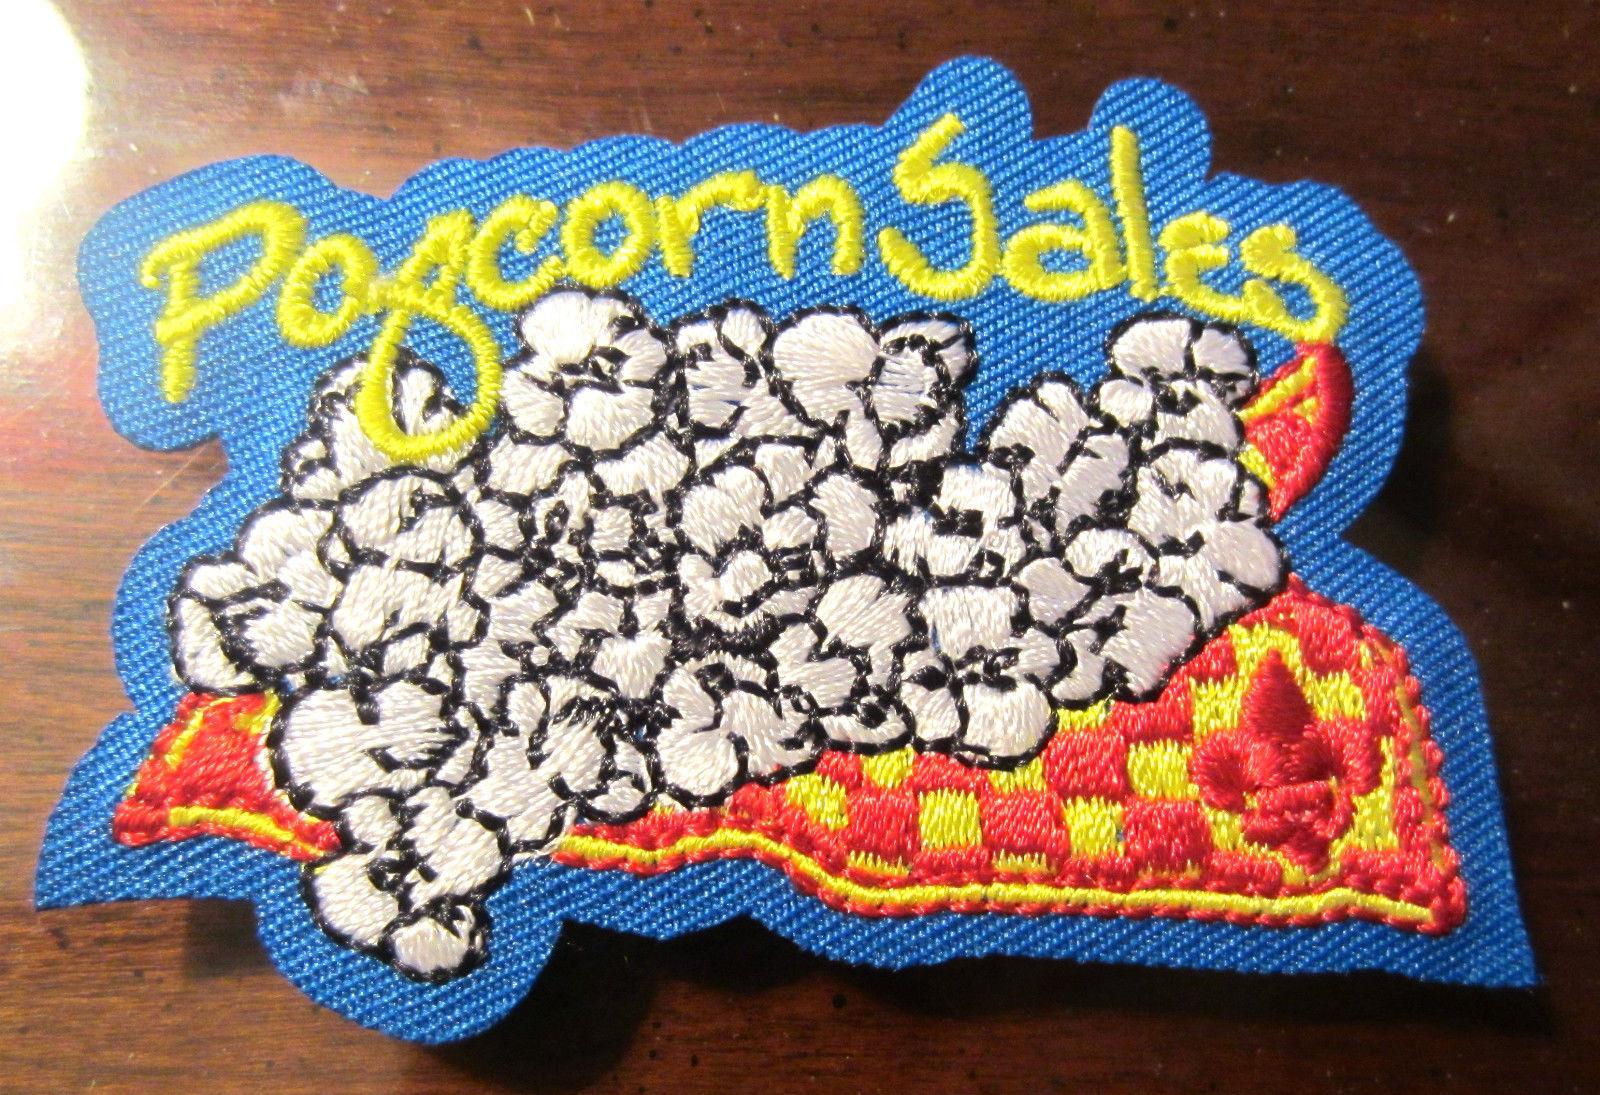 Bsa Boy Scout Uniform Patch Bsa Popcorn Sales | eBay